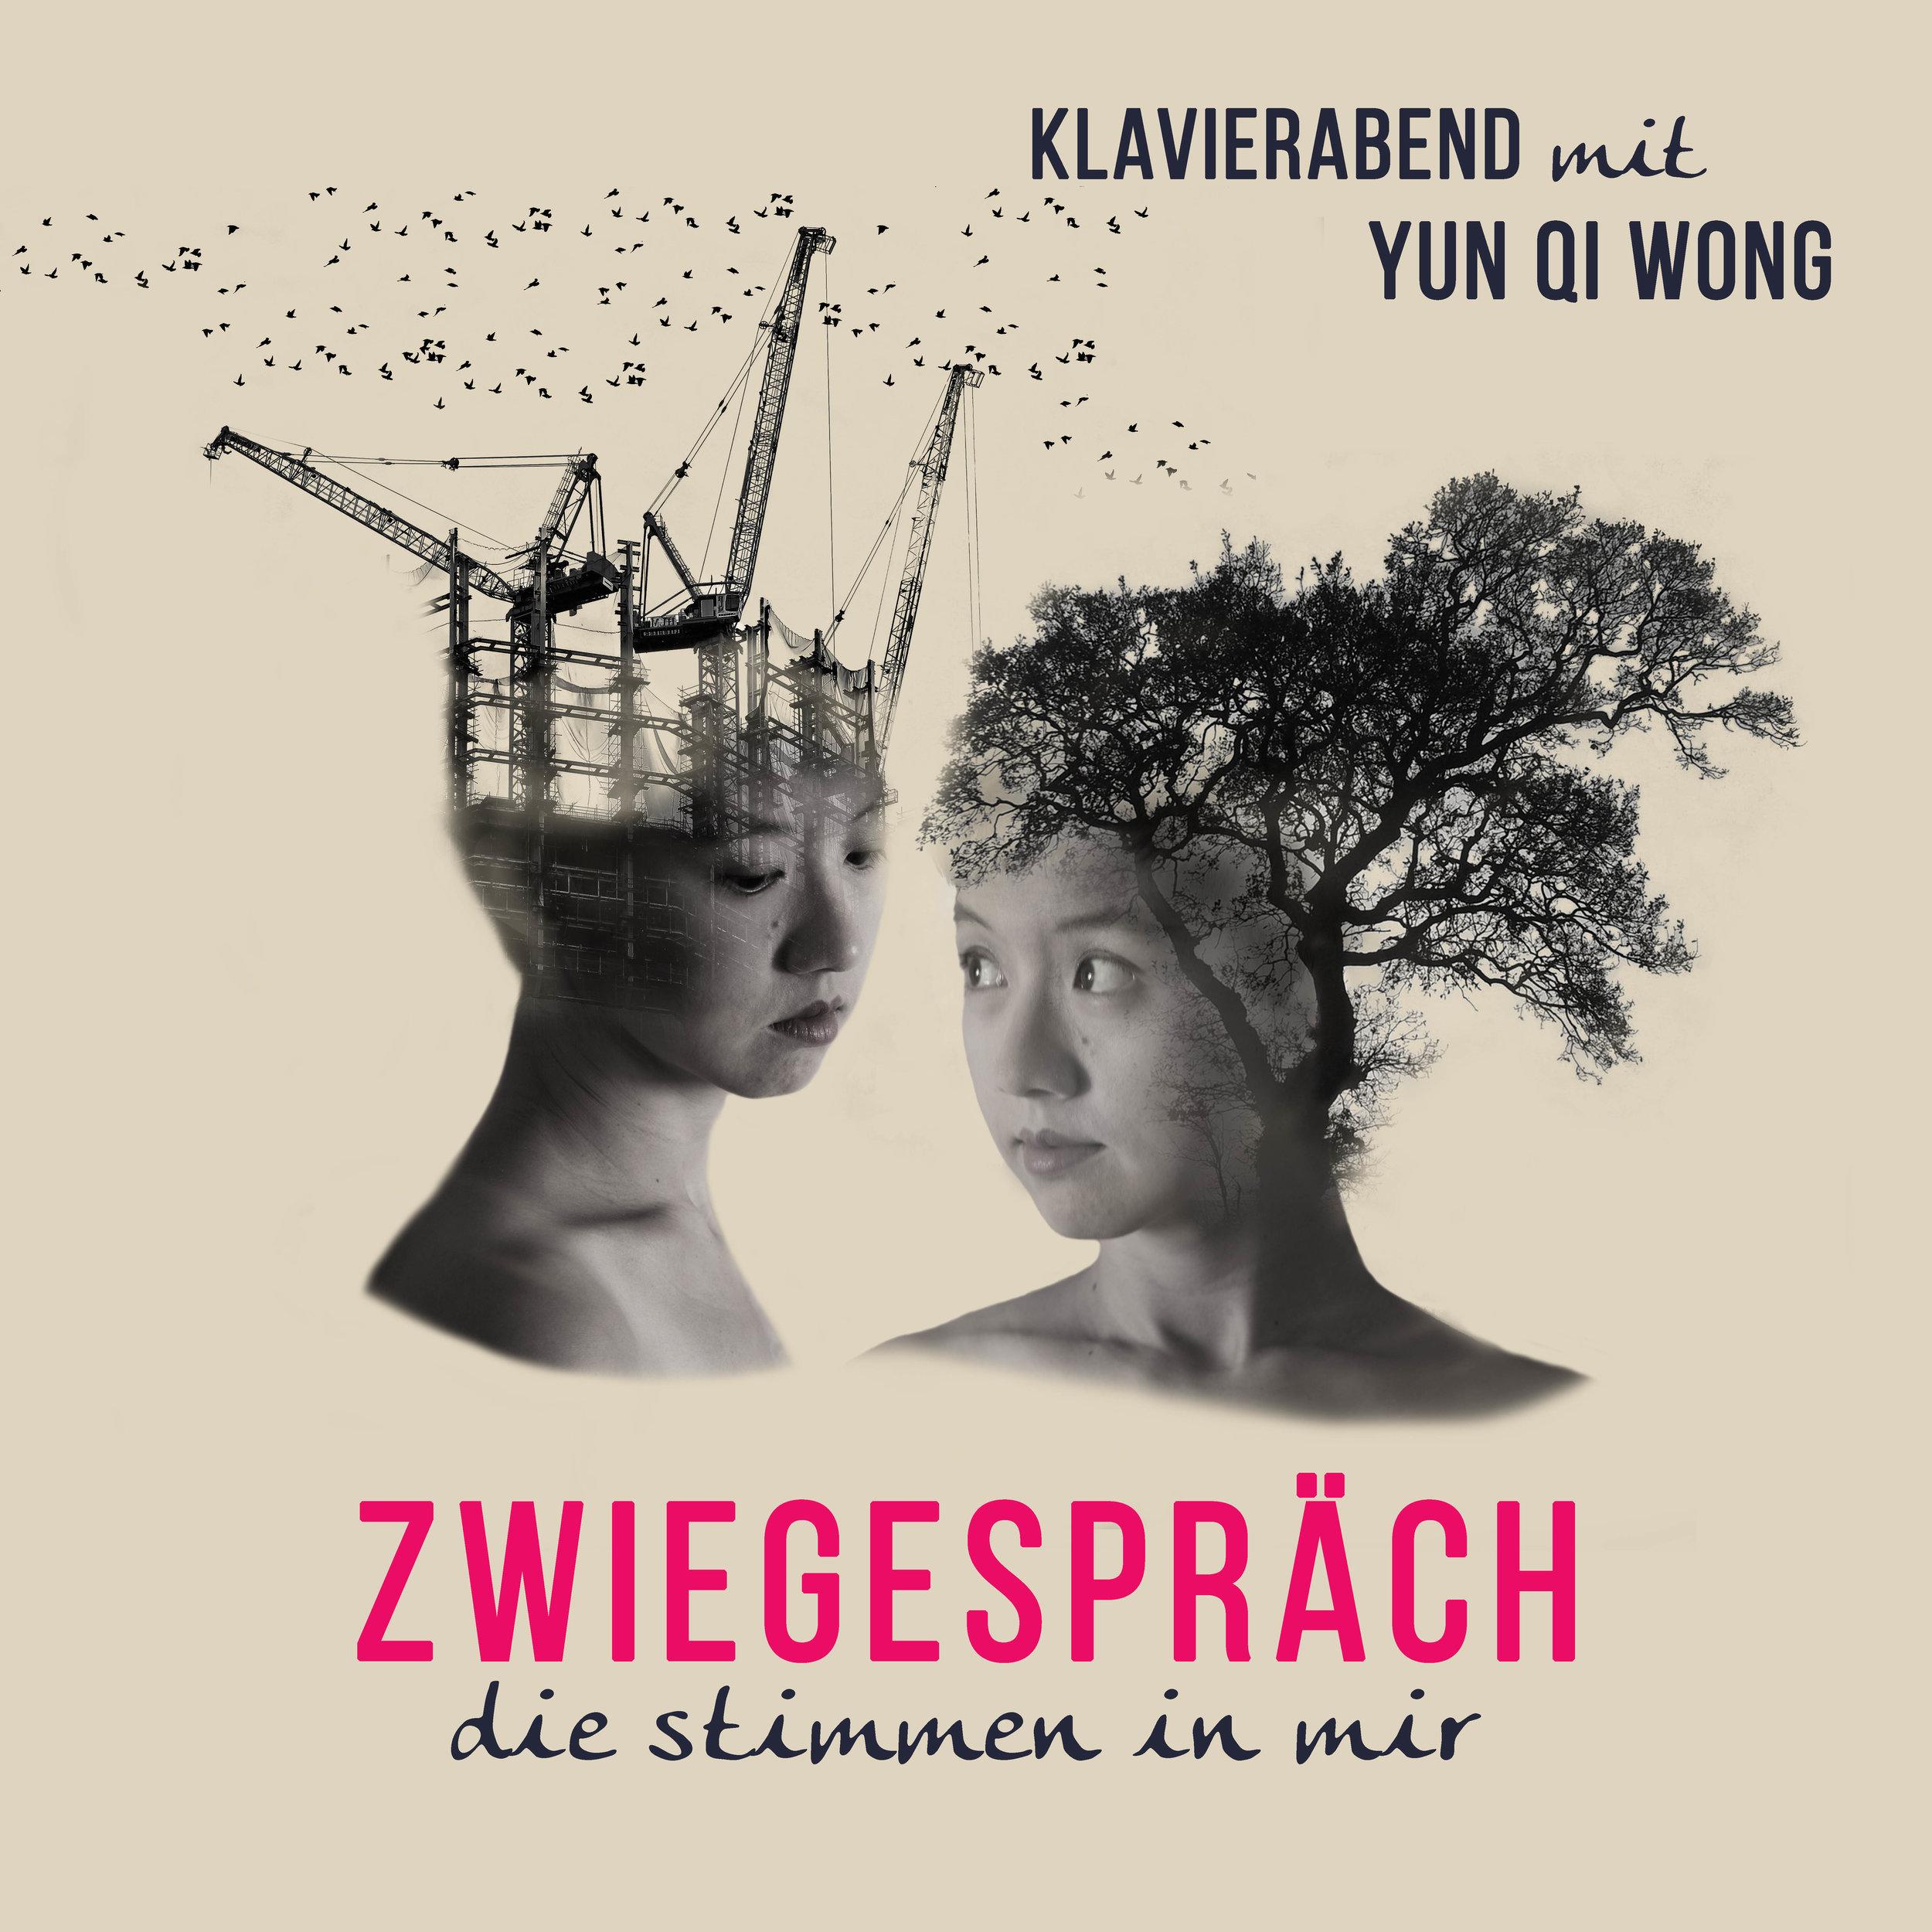 poster Zwiegespräch version 210519 small.jpg